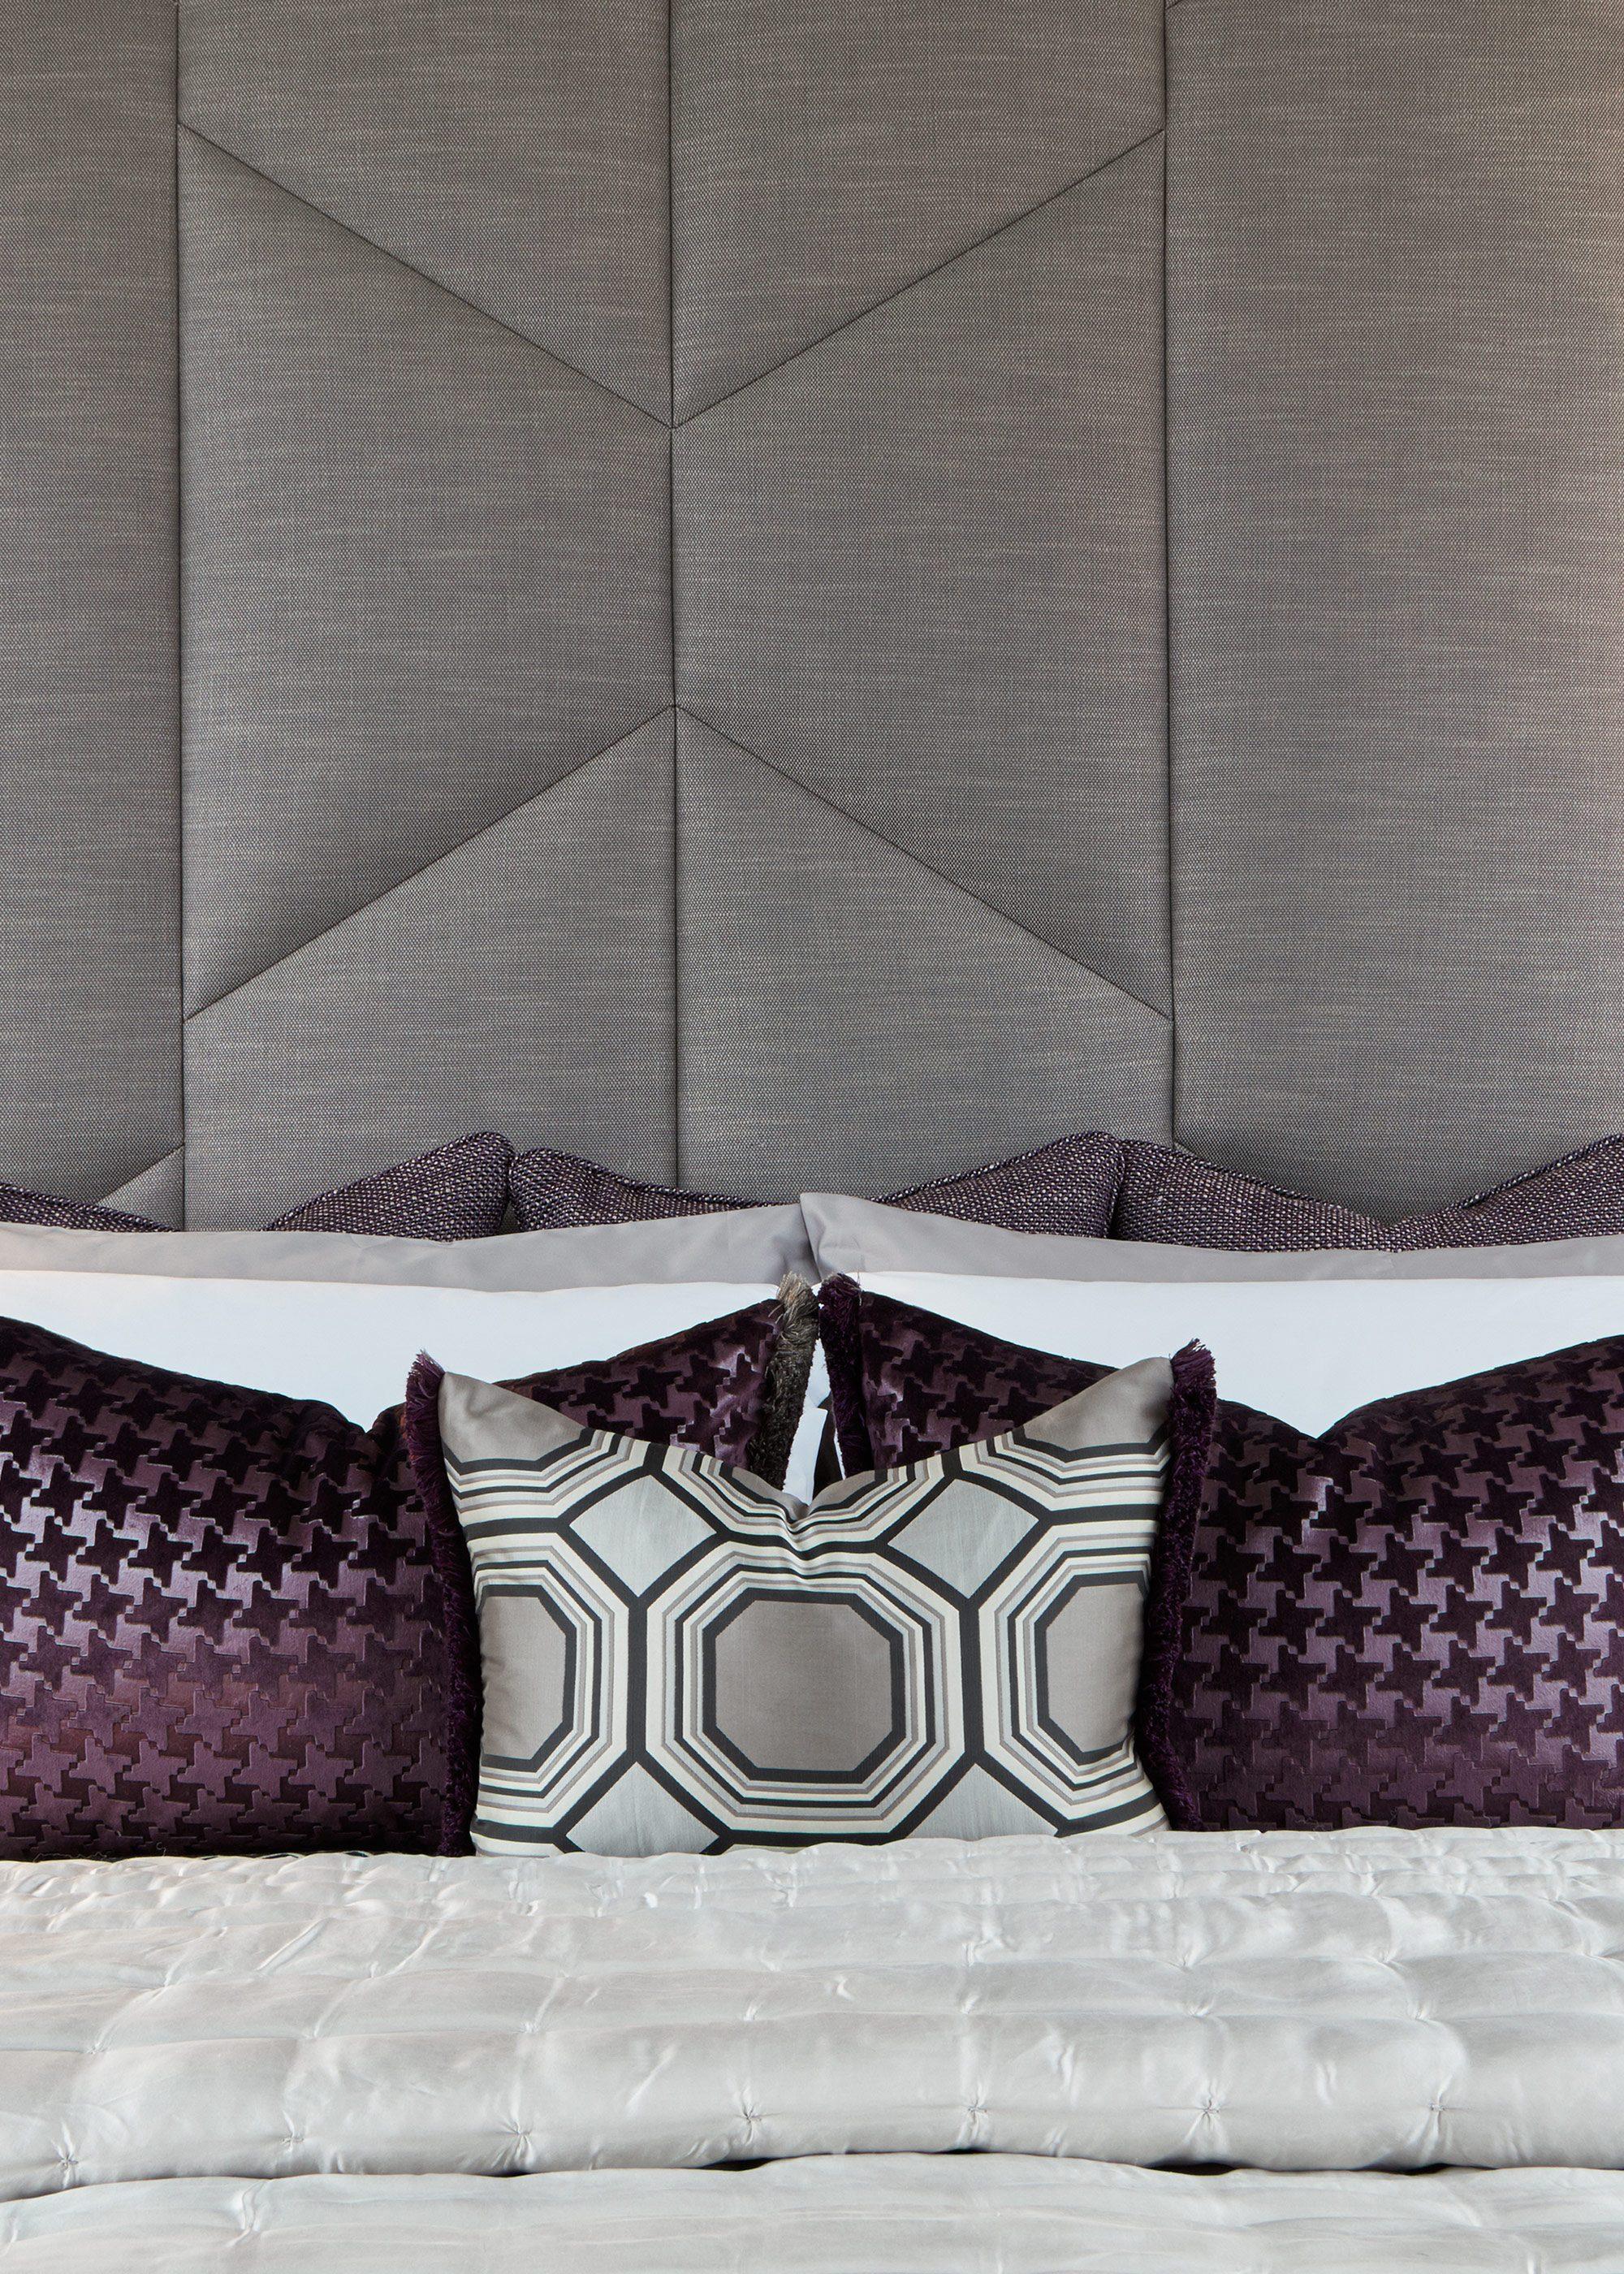 Honky Interior Design Trafalgar Square London Bedroom Detail 2